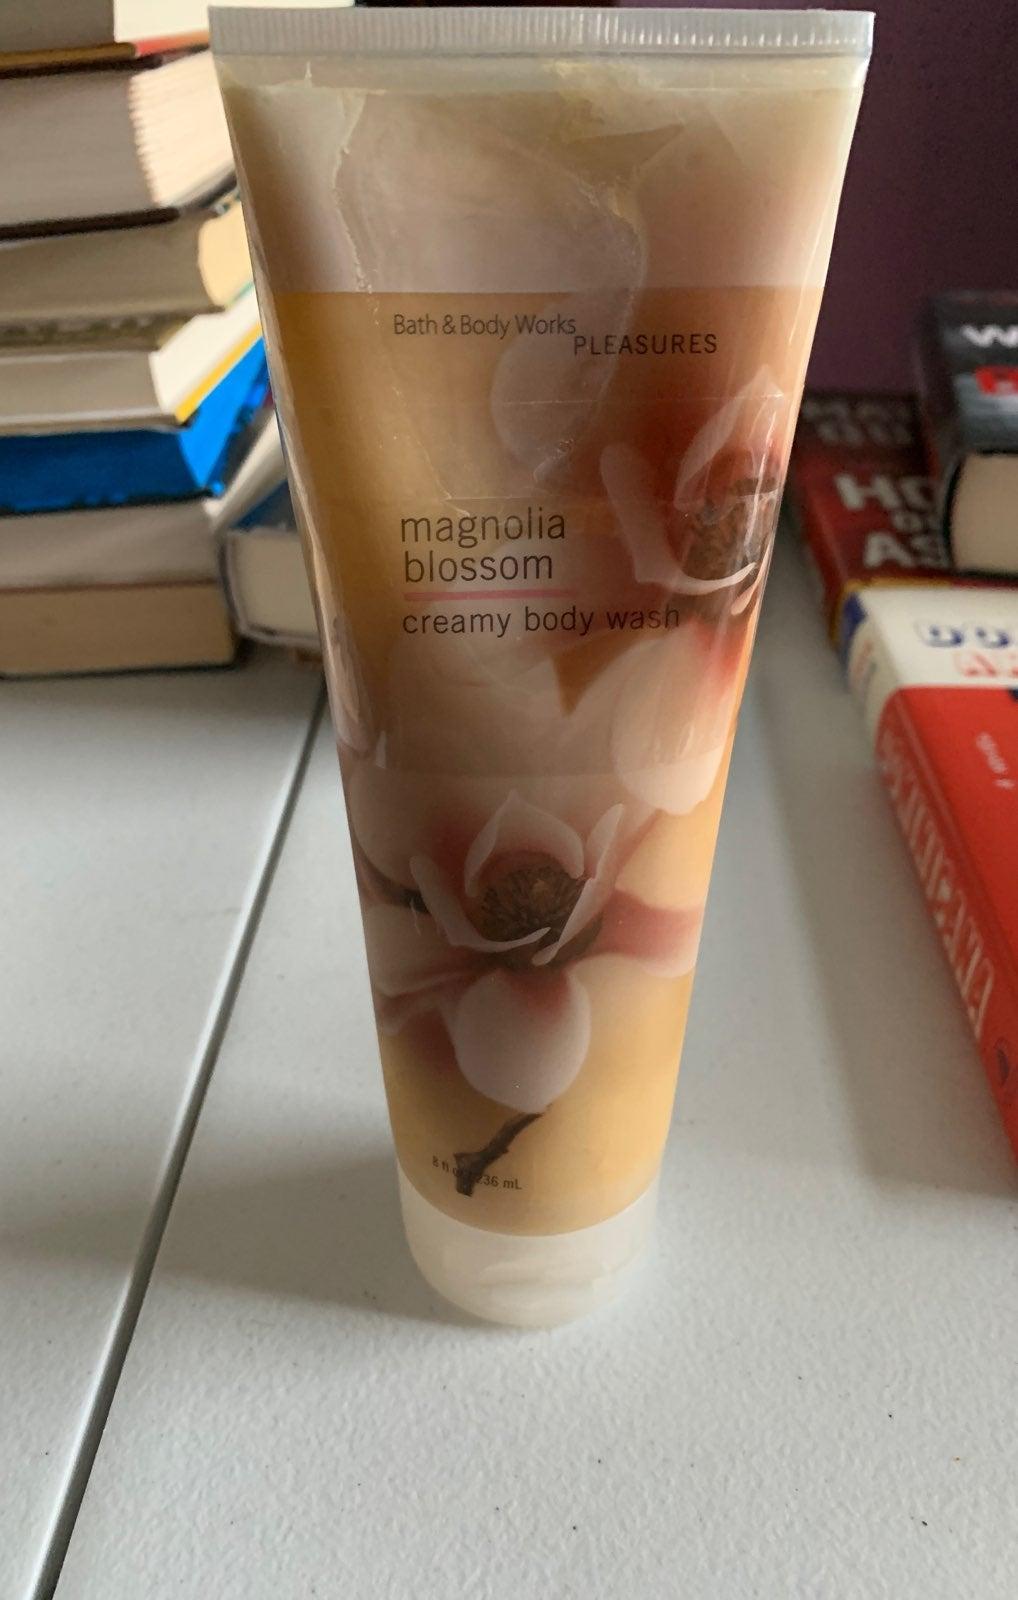 Bath and Body Works Magnolia Blossom